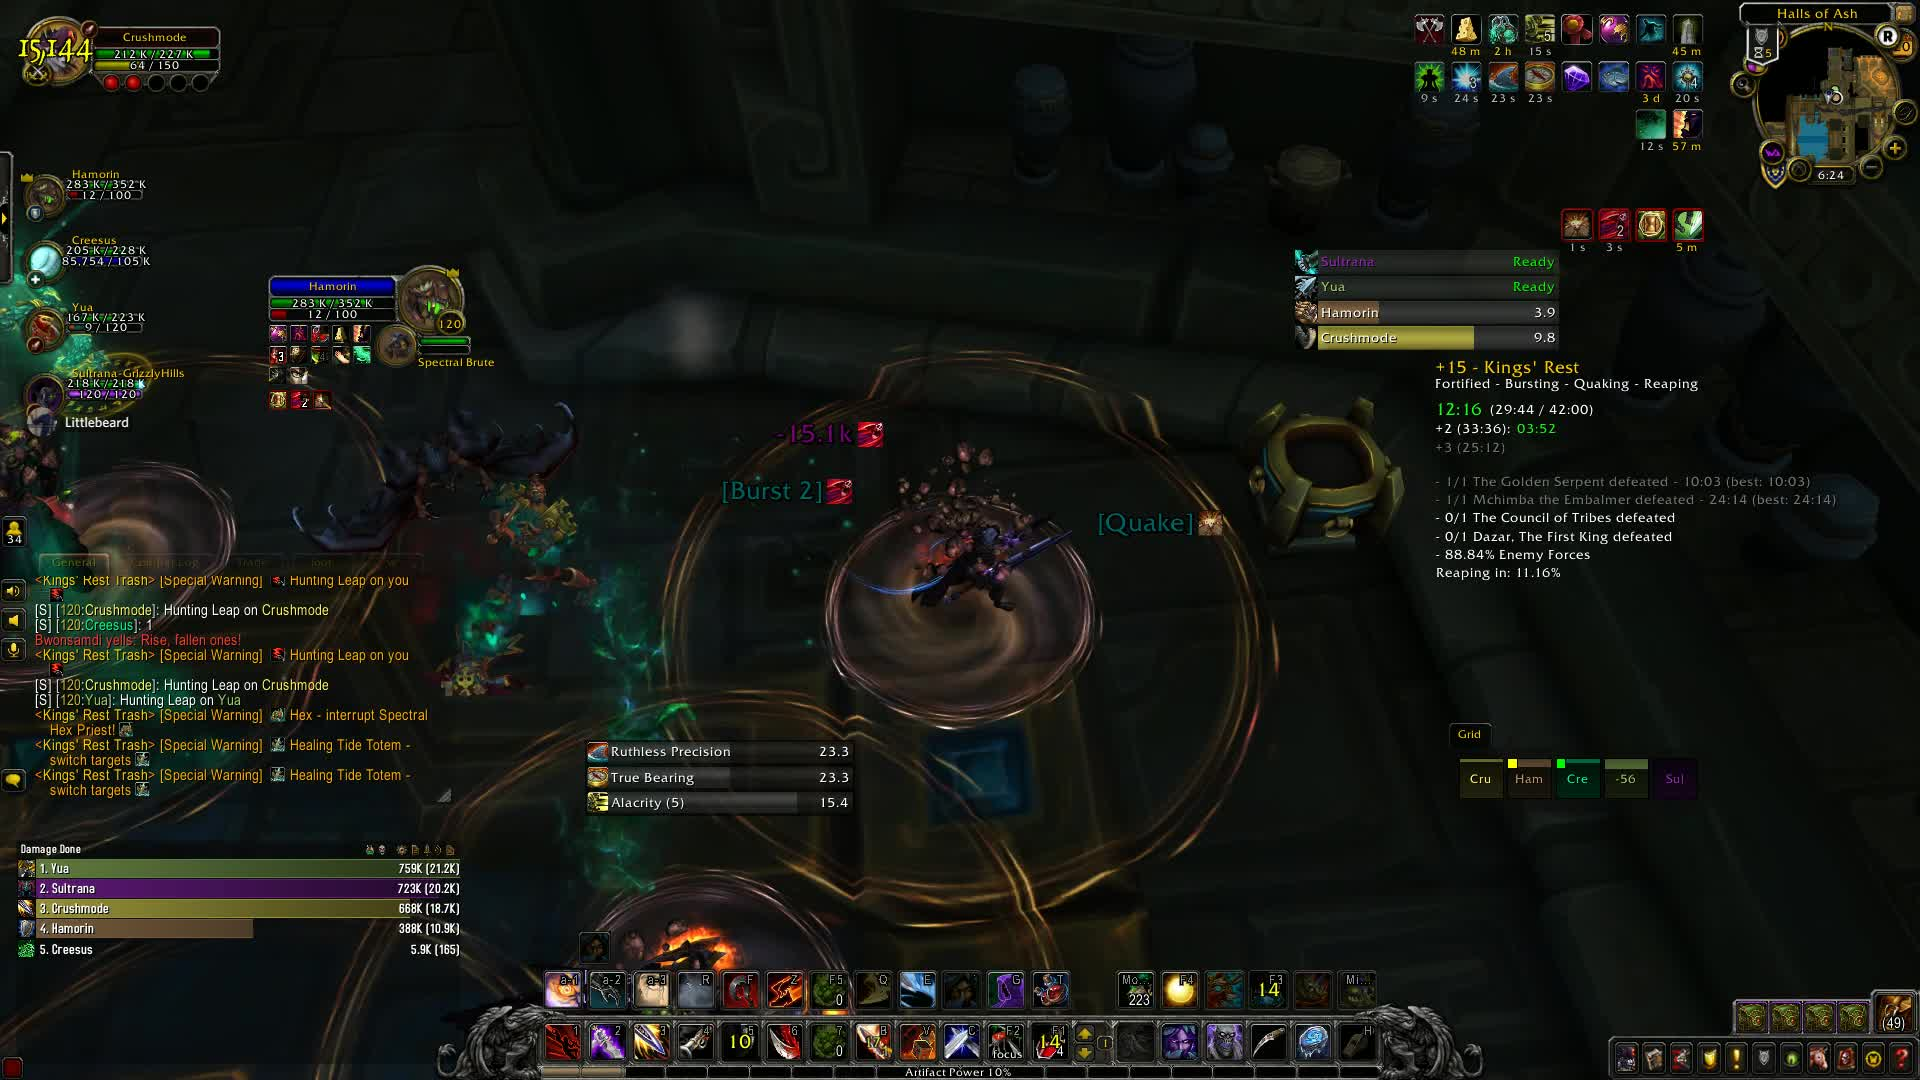 worldofwarcraft, World Of Warcraft 2019.04.20 - 18.25.31.02.DVR GIFs